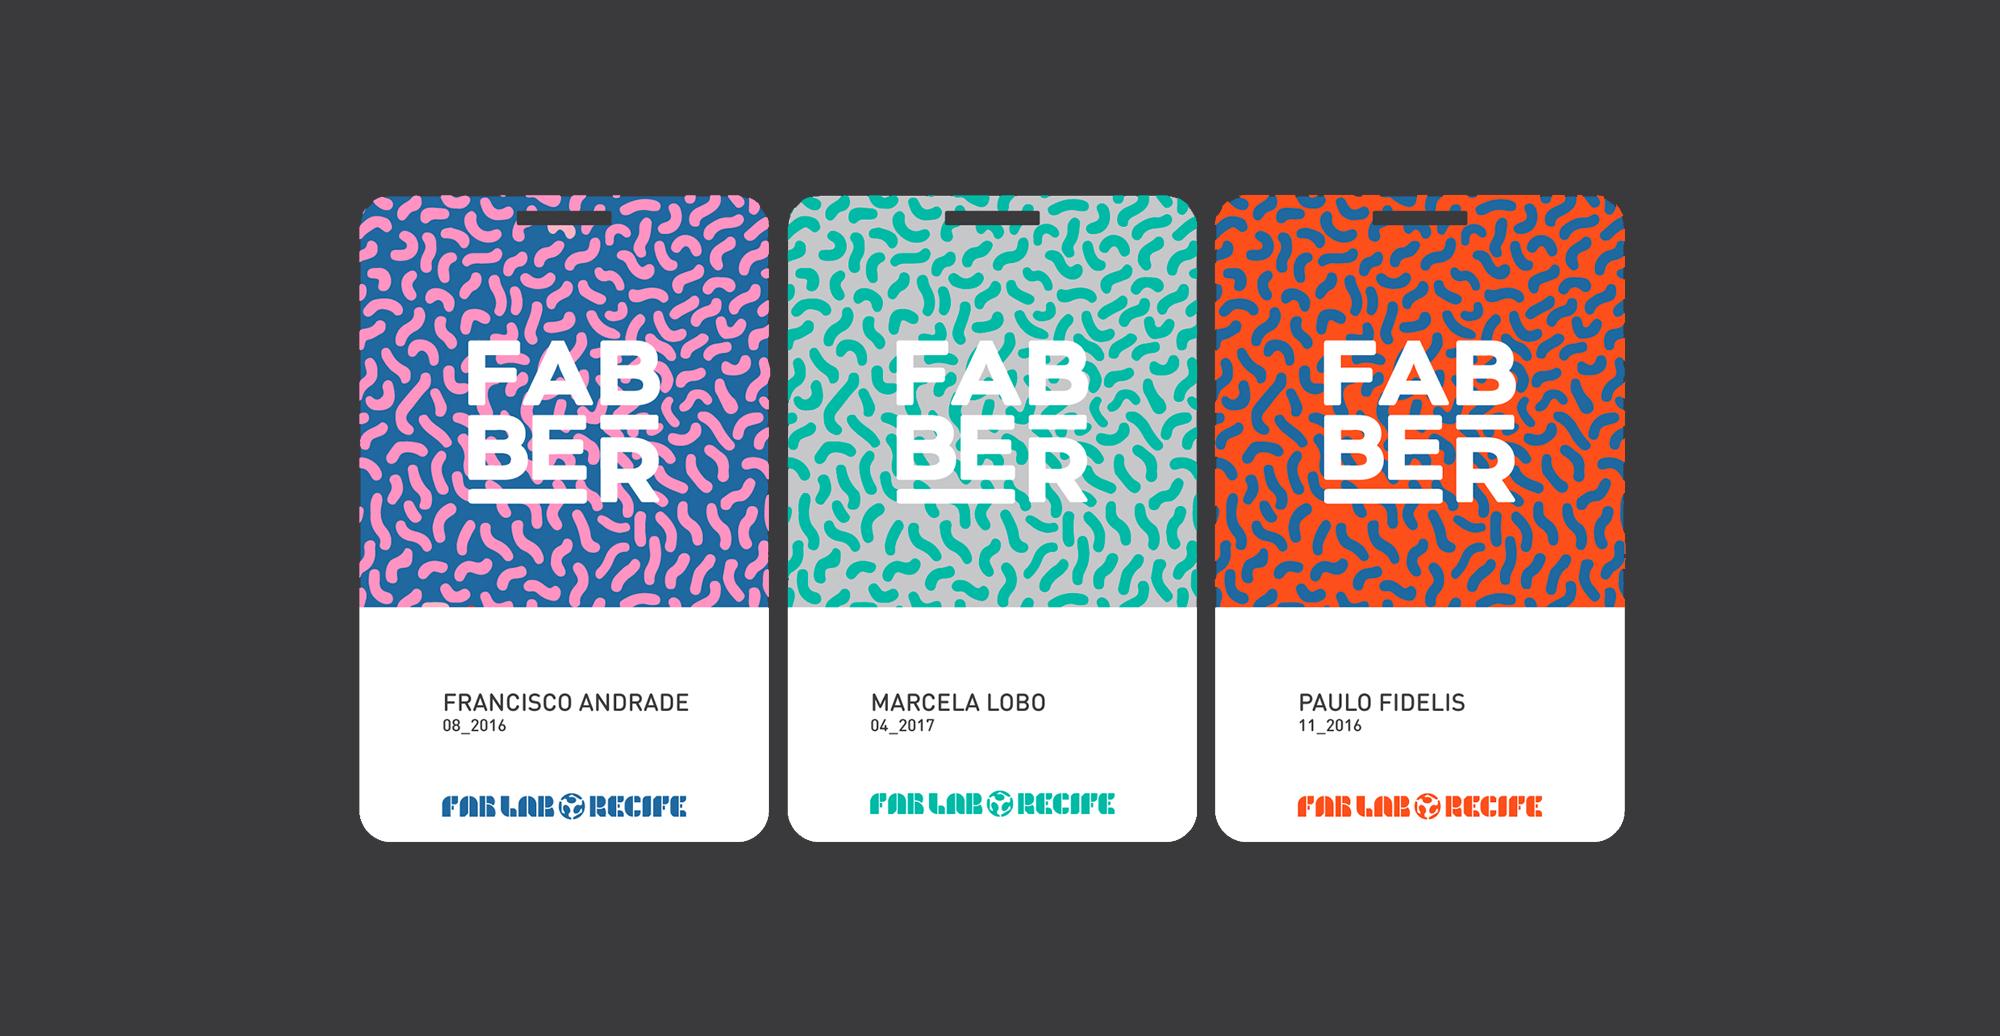 crachas-fabber-2